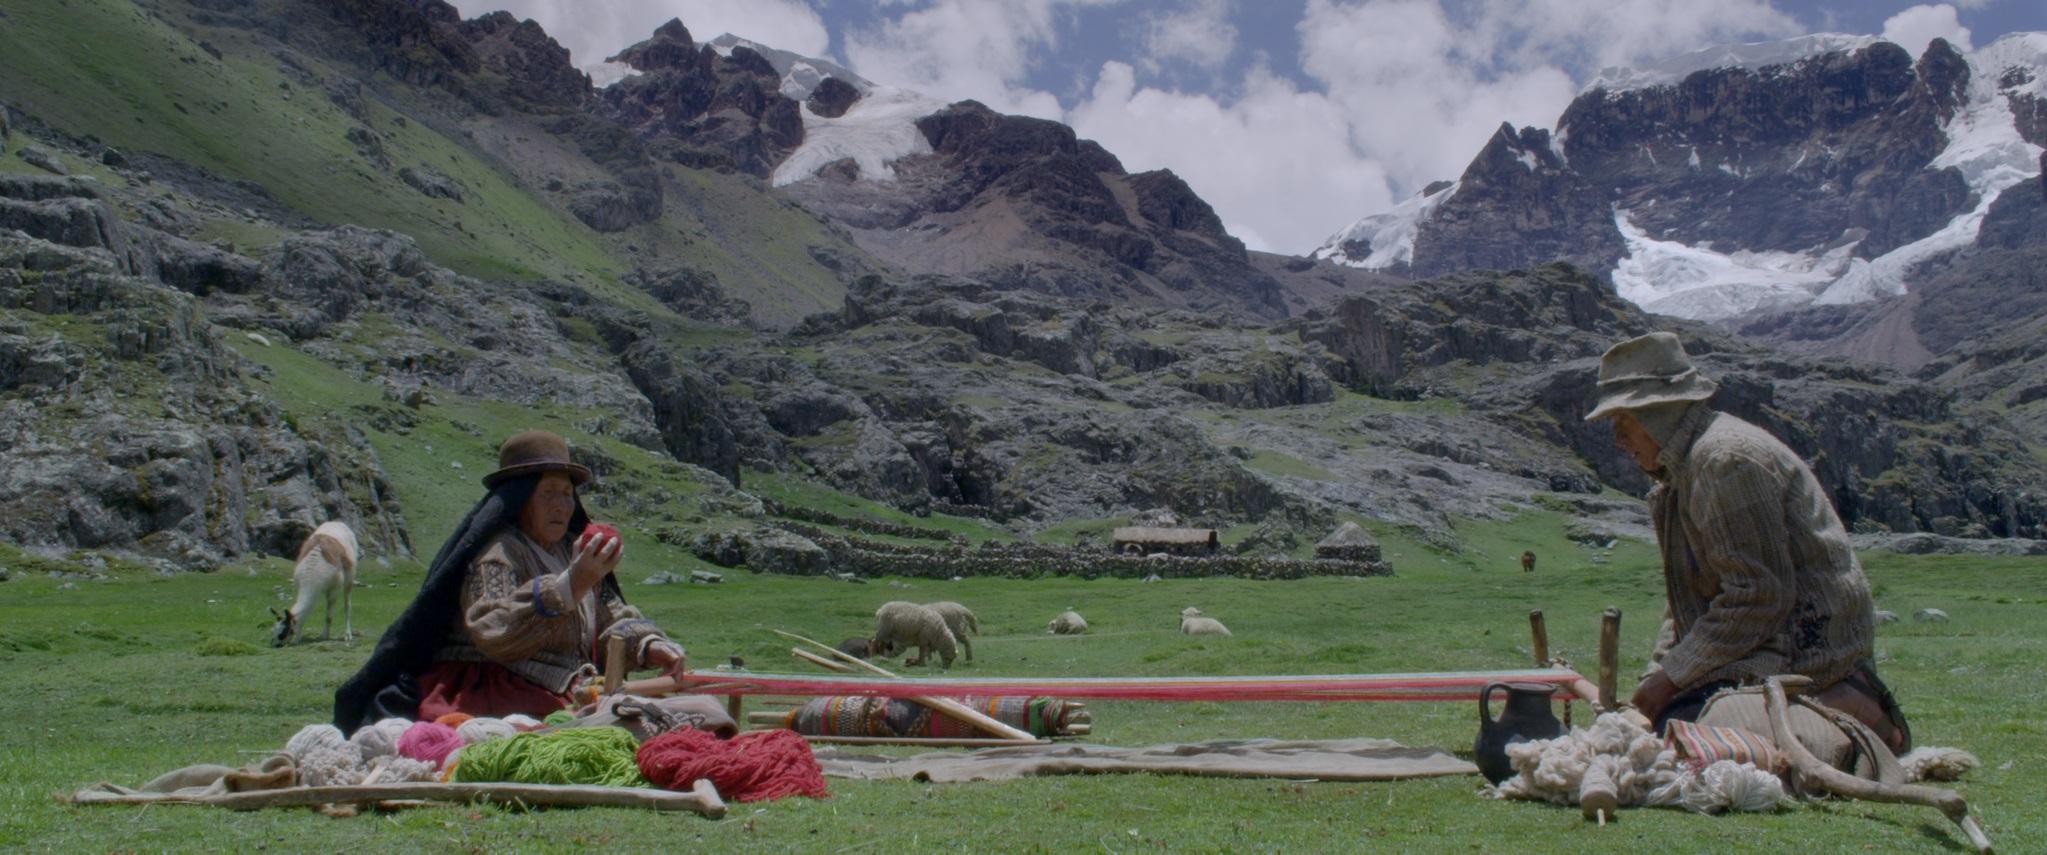 TRAILER: 'Wiñaypacha' Is the First Peruvian Movie Shot Entirely in the Aymara Language